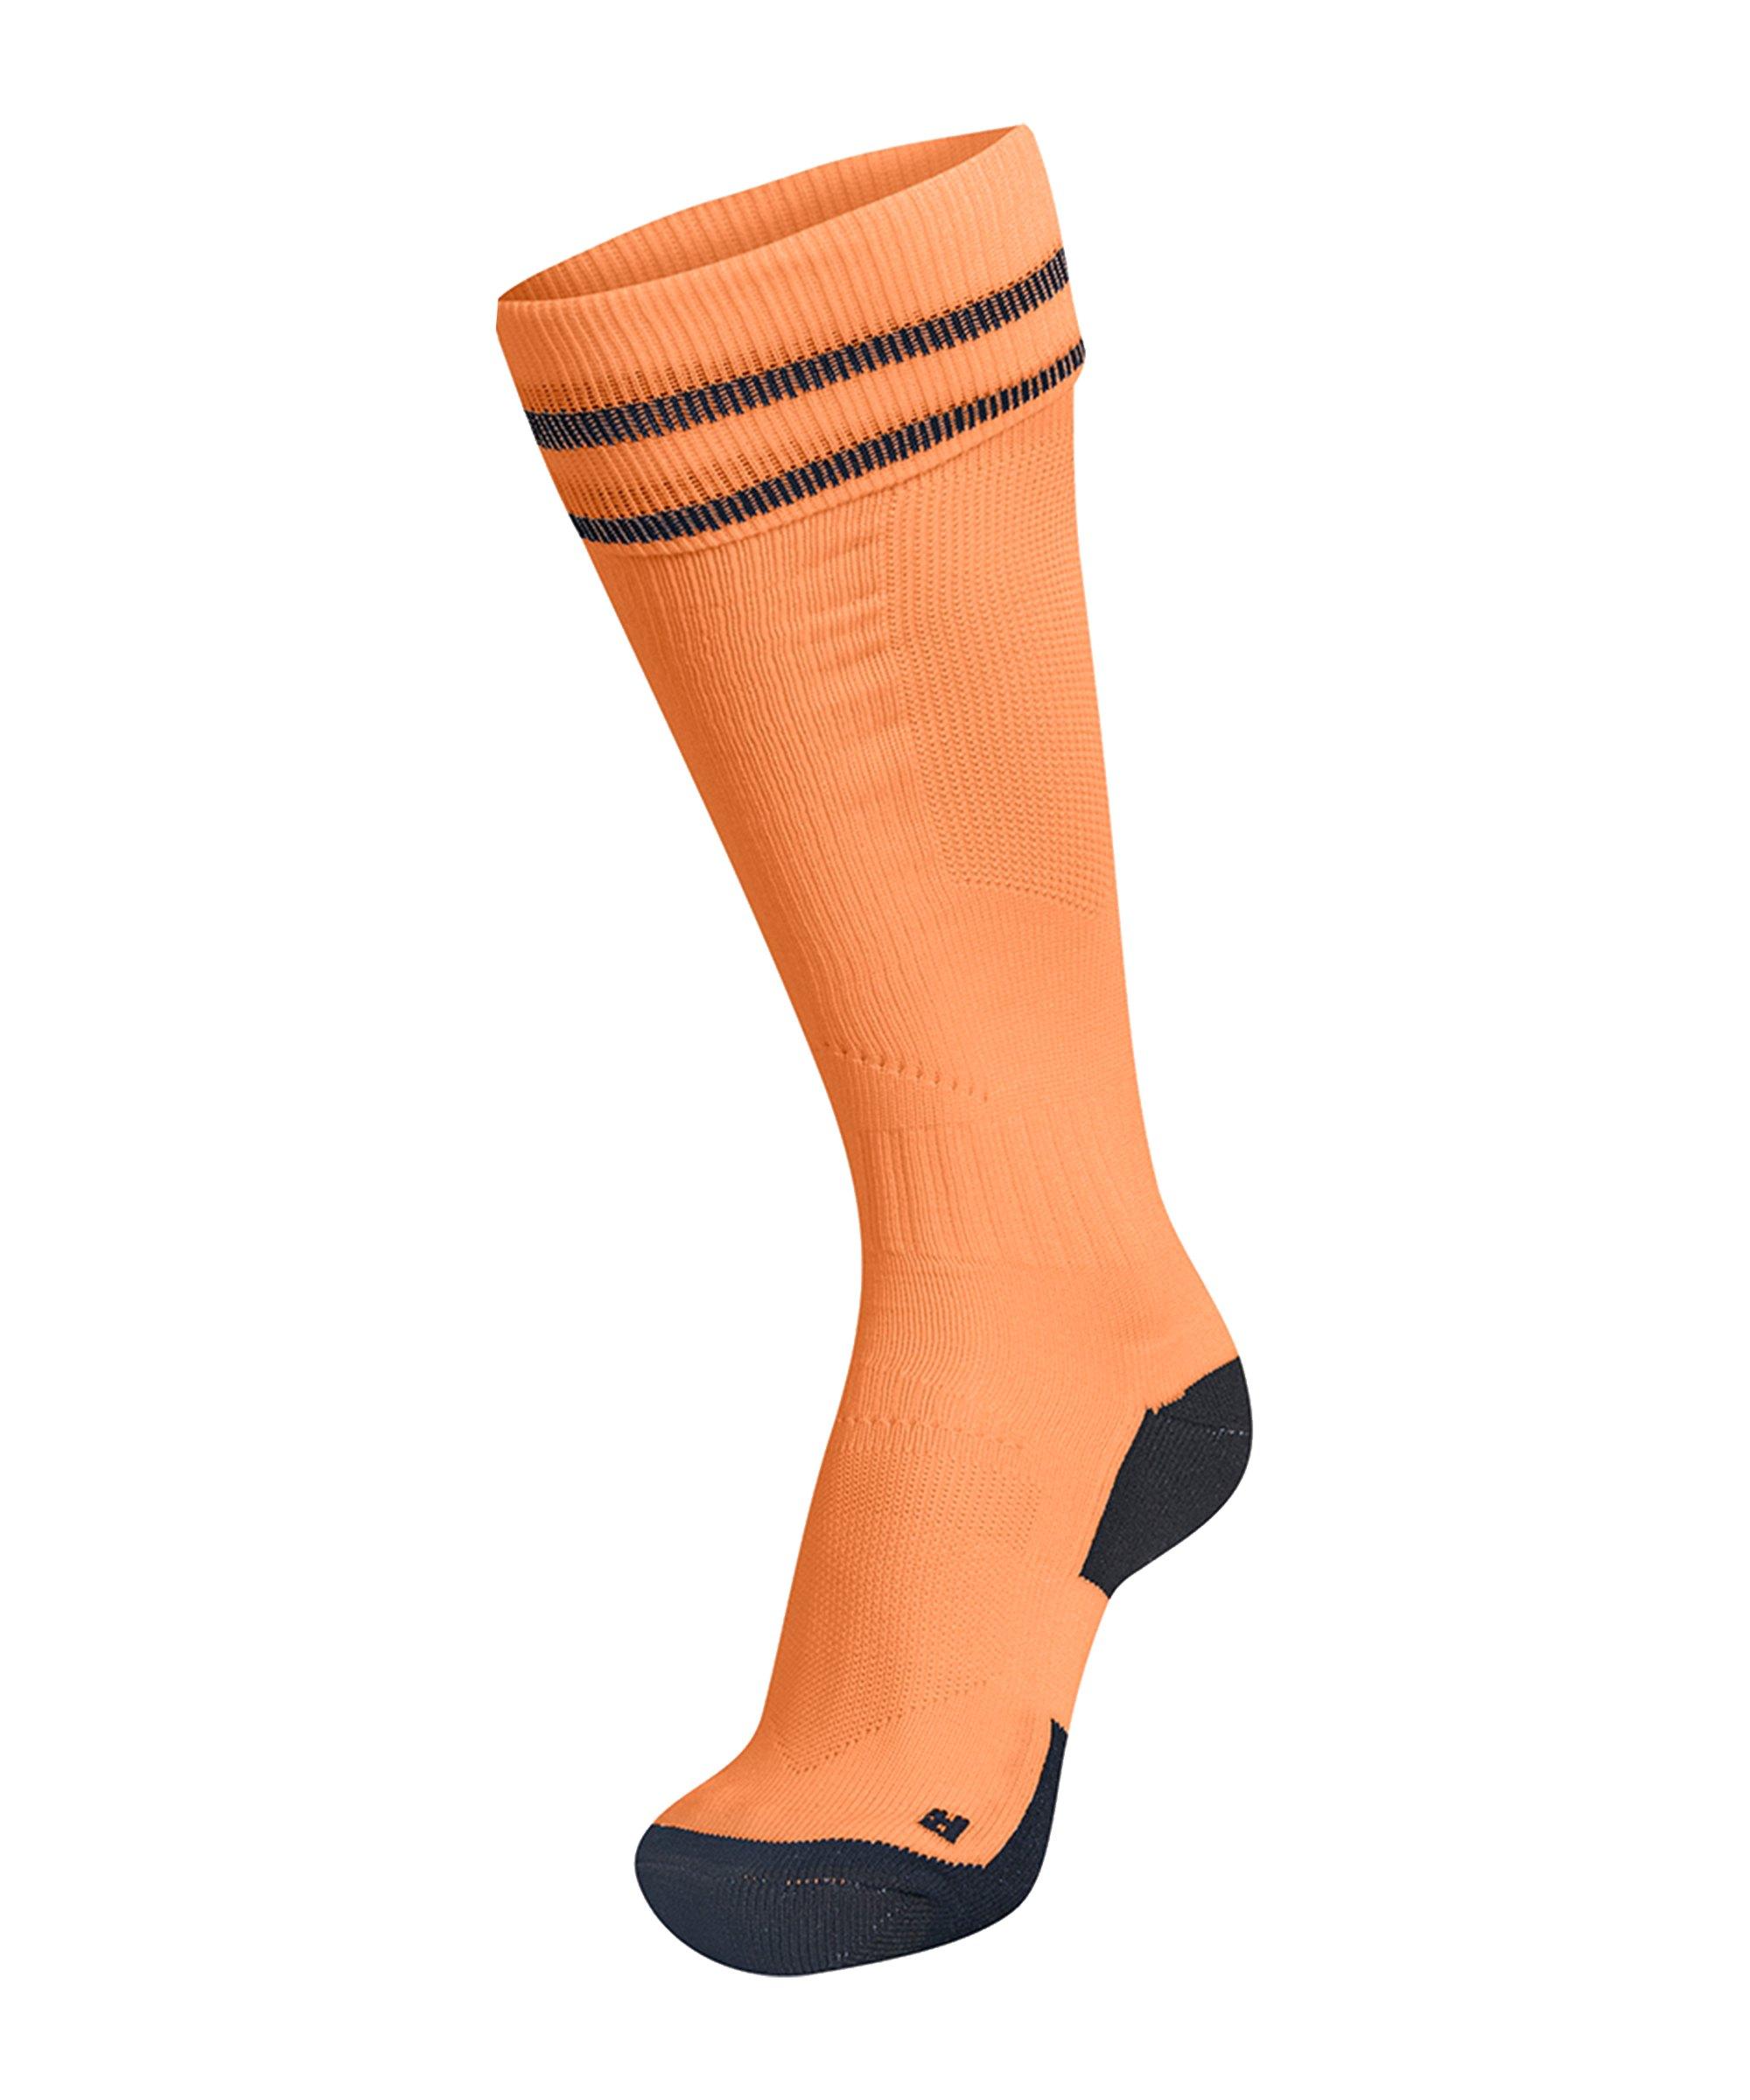 Hummel Football Sock Socken Orange F5006 - orange